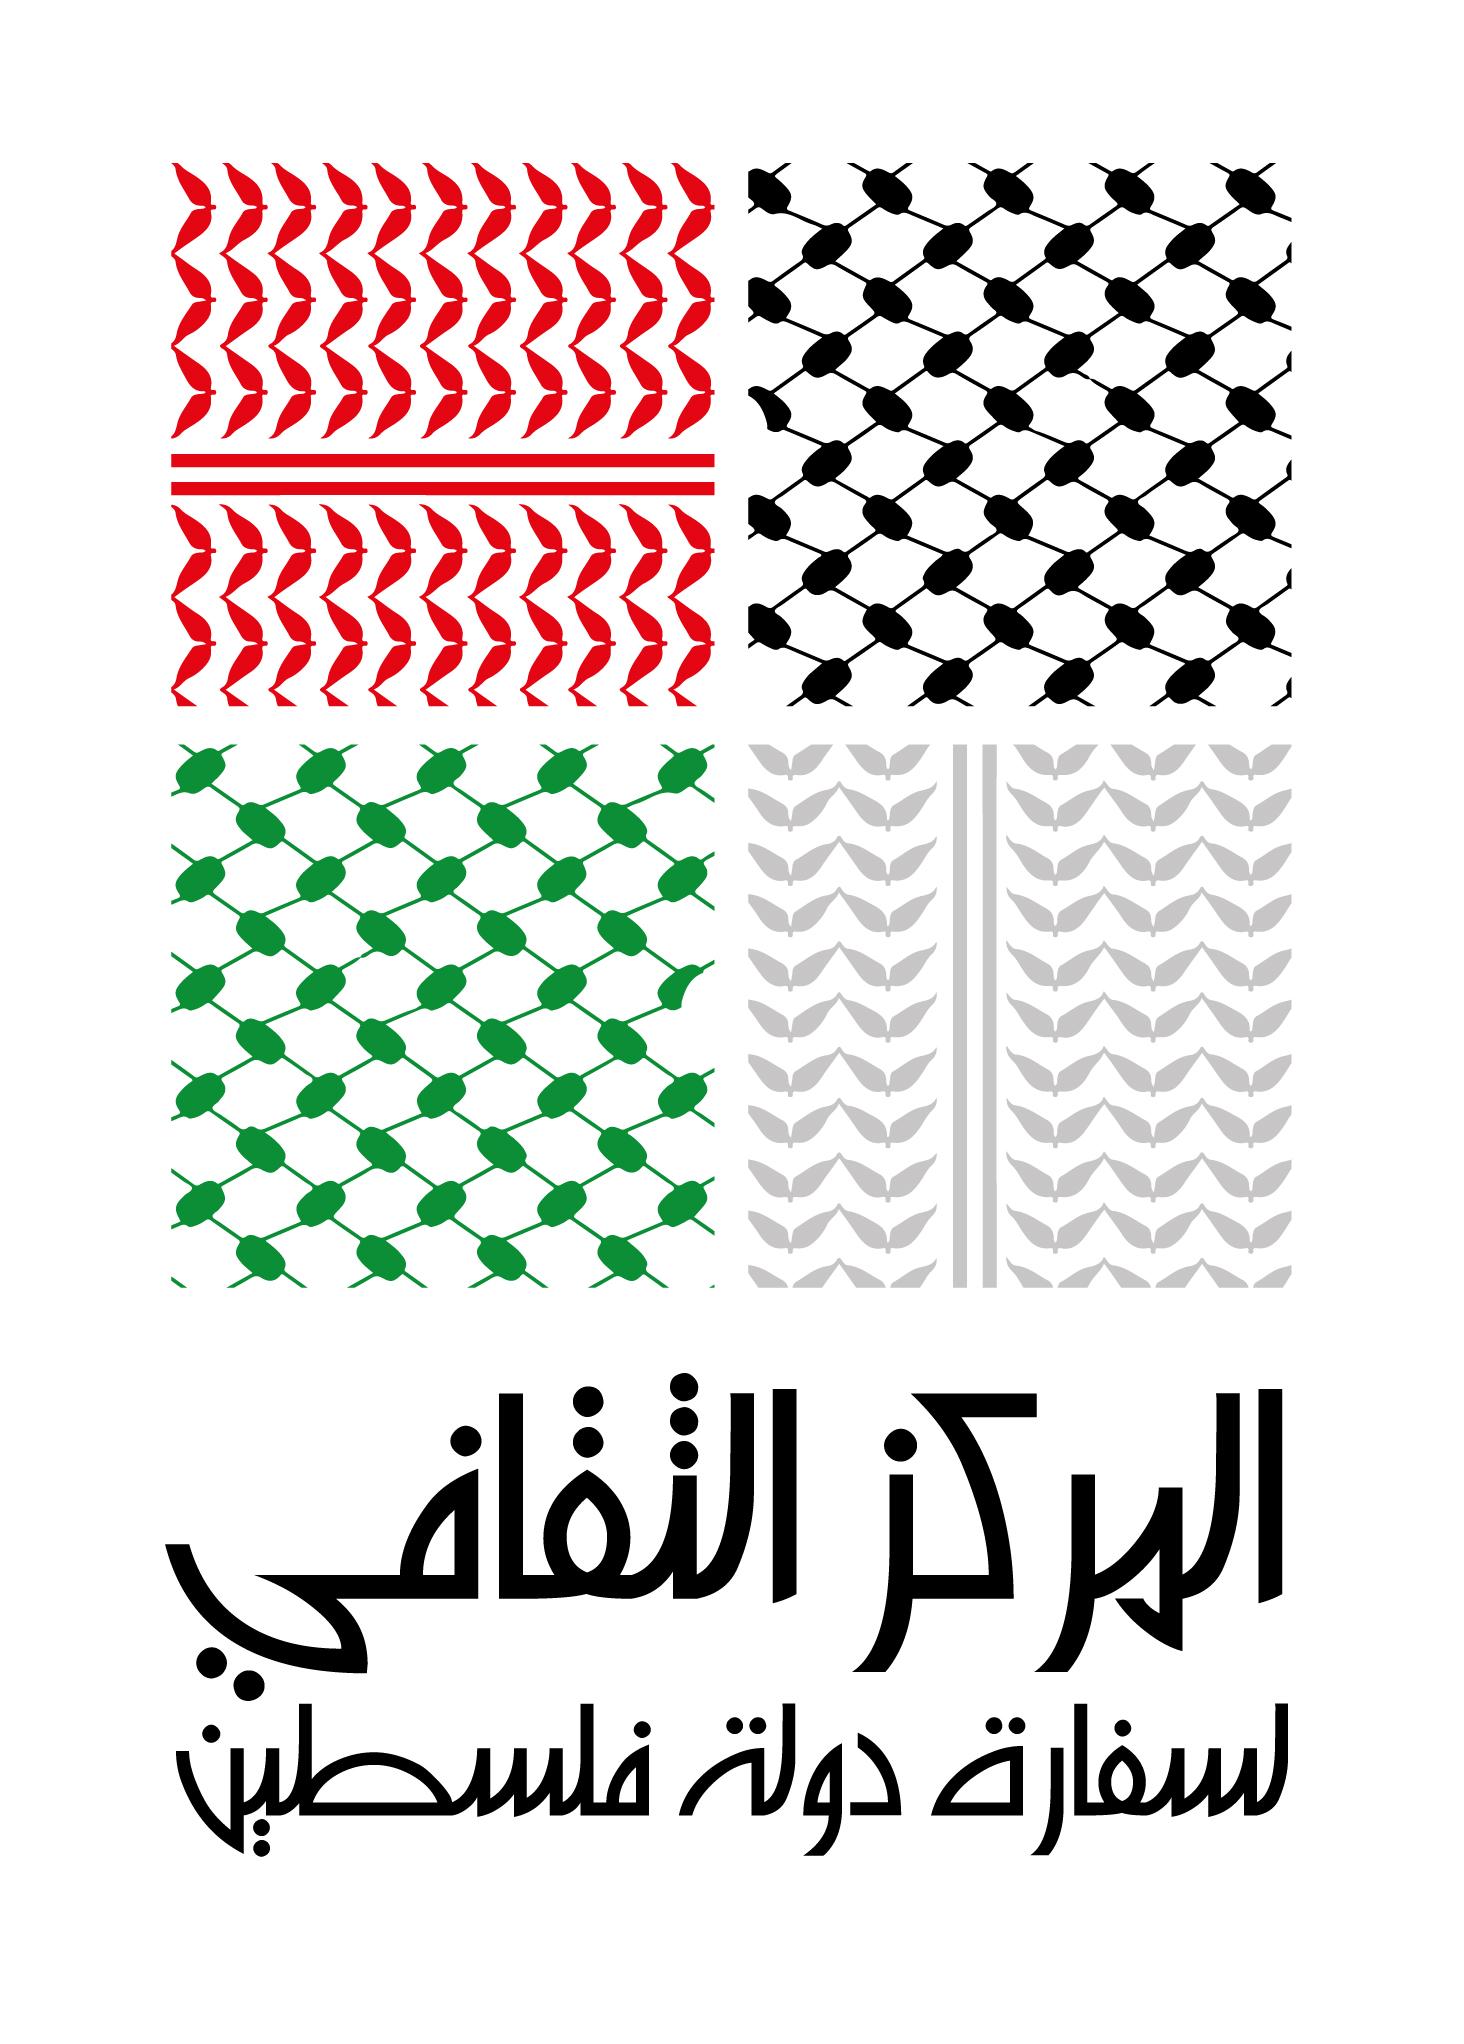 Branding – Centre culturel Palestinien du Maroc